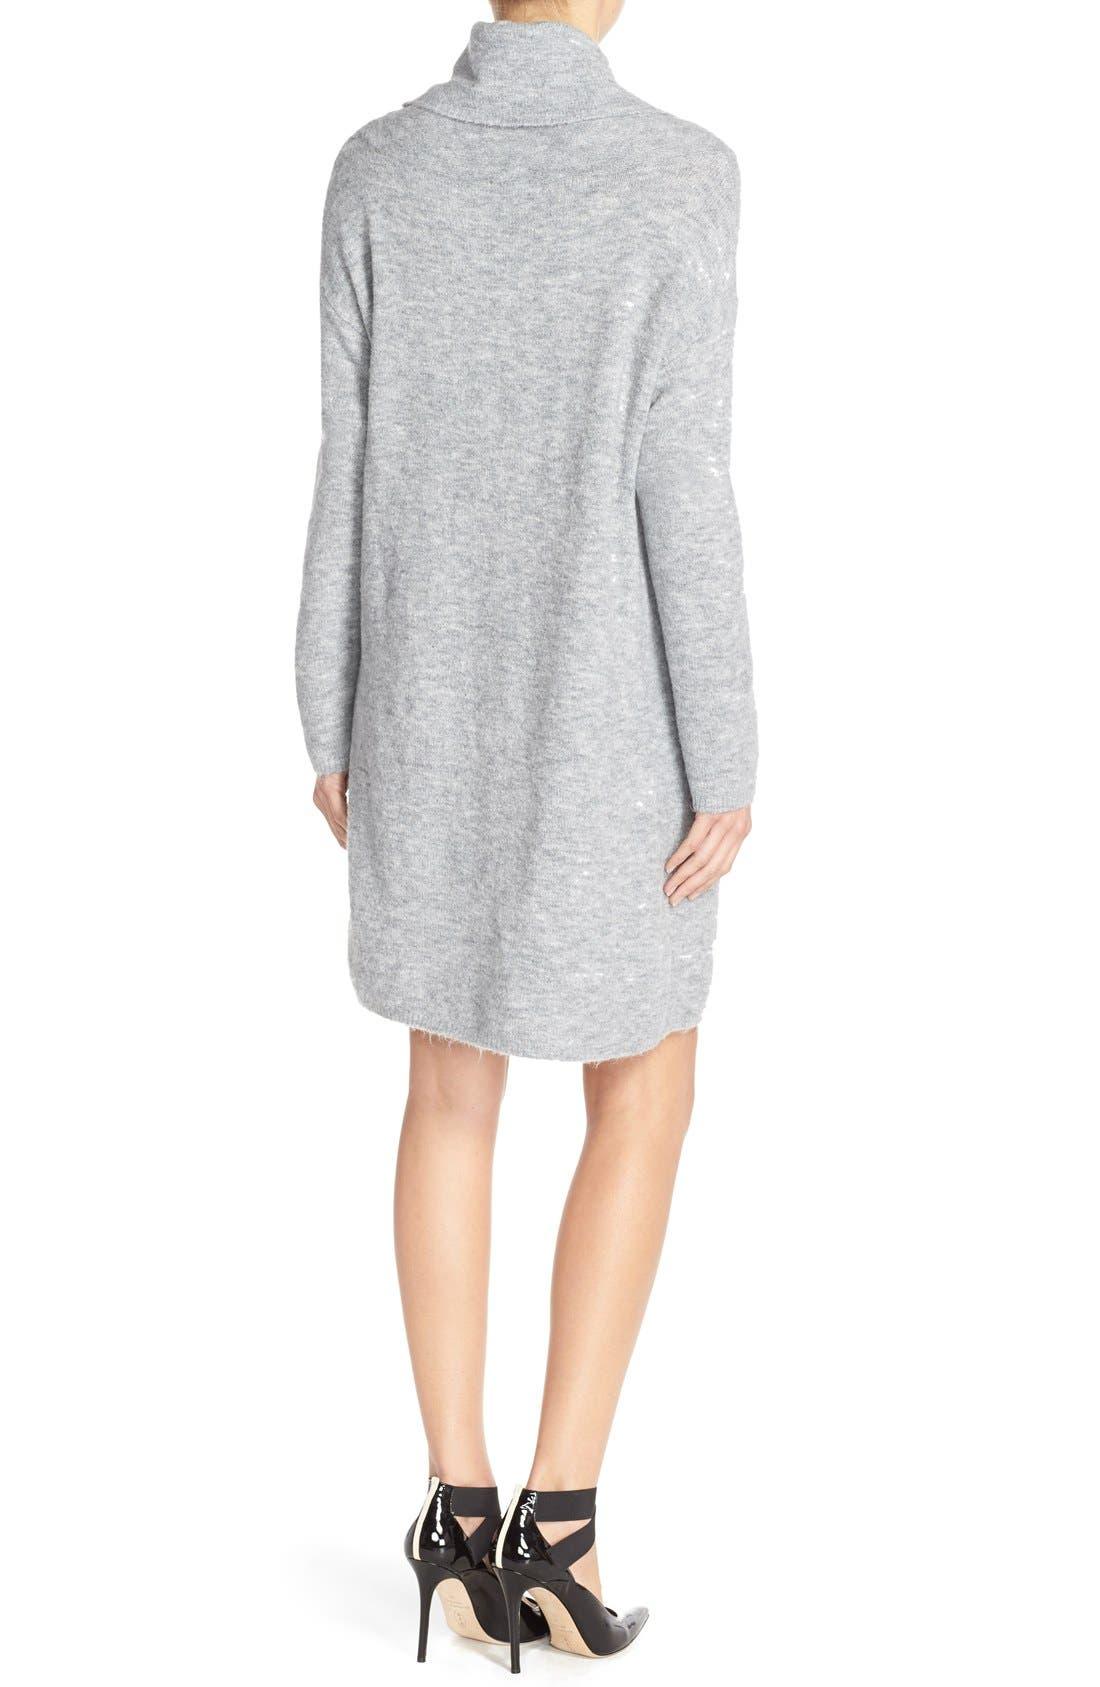 'Leighton' Turtleneck Sweater Dress,                             Alternate thumbnail 2, color,                             Grey